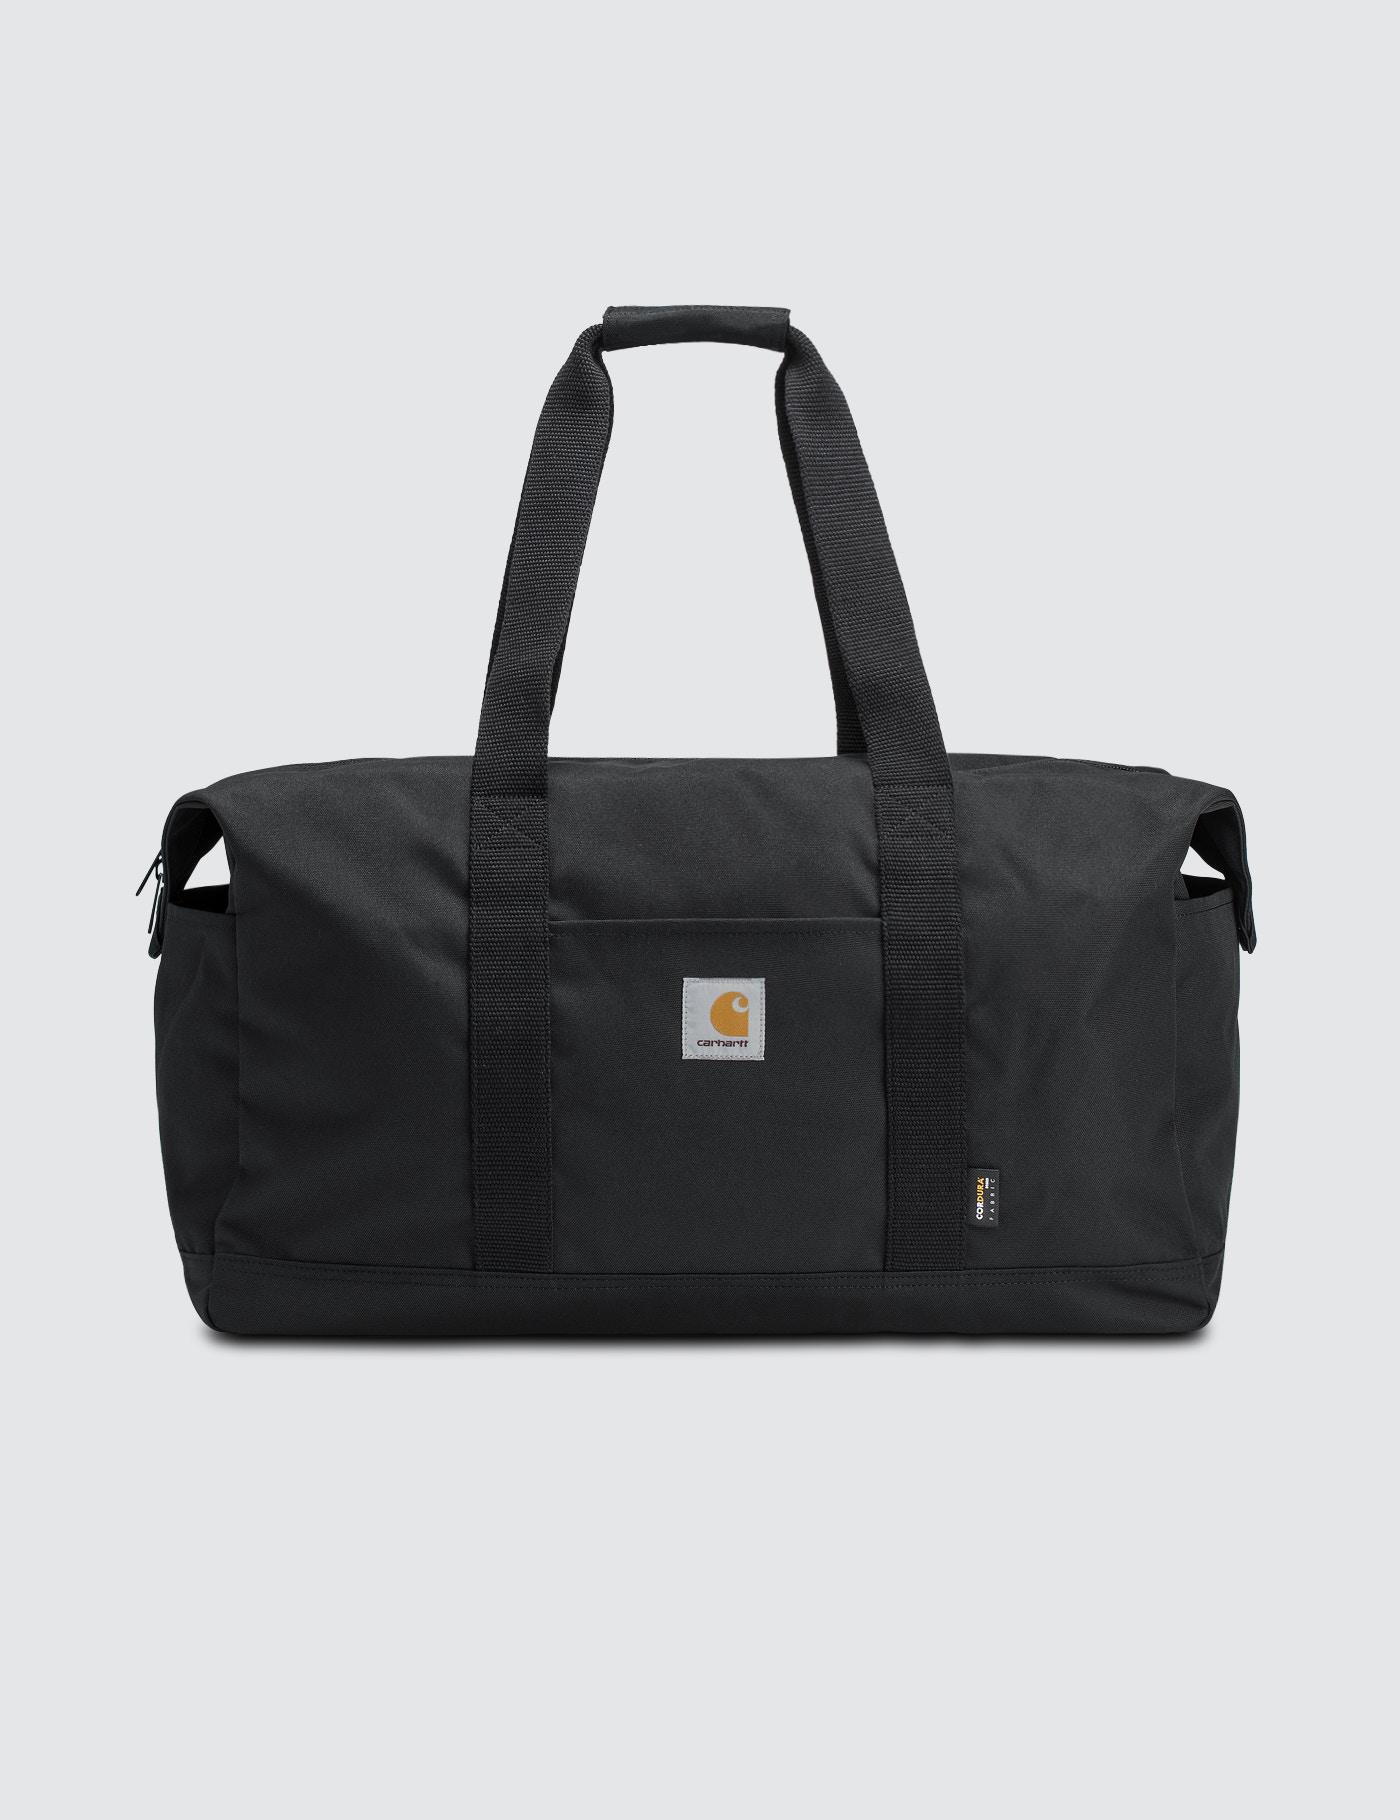 Lyst - Carhartt WIP Watch Sport Bag in Black for Men 0d799f0c6bb67